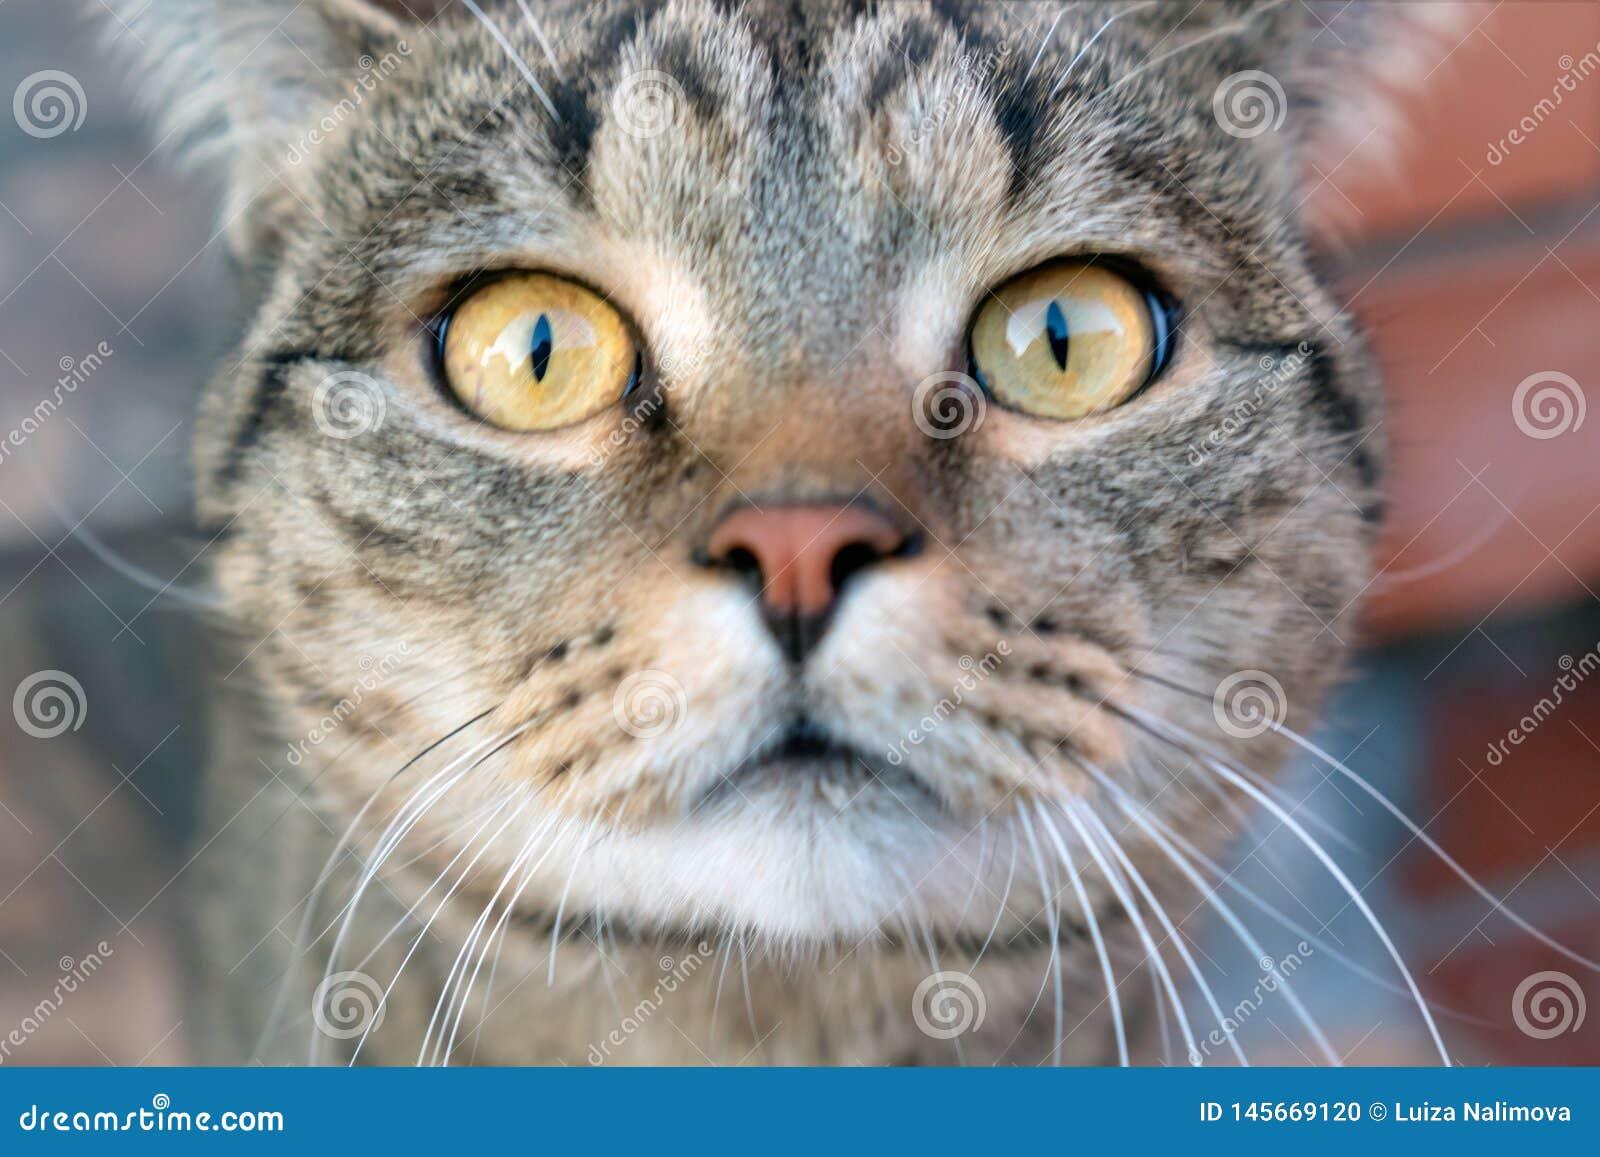 Eyes of a cat.